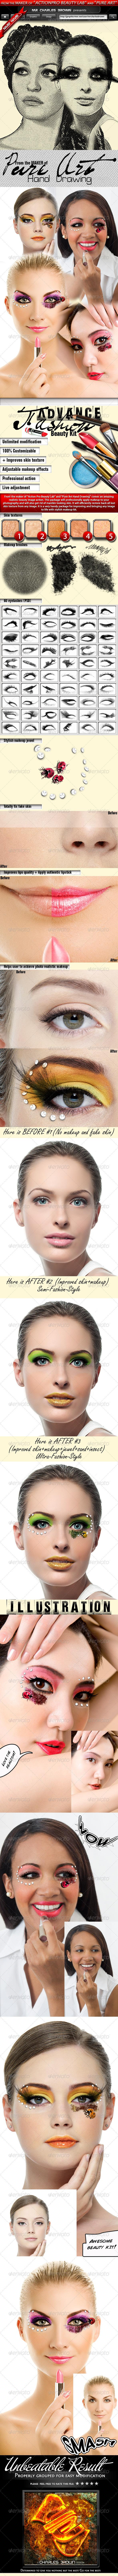 GraphicRiver Advance Beauty Fashion Kit 3832261